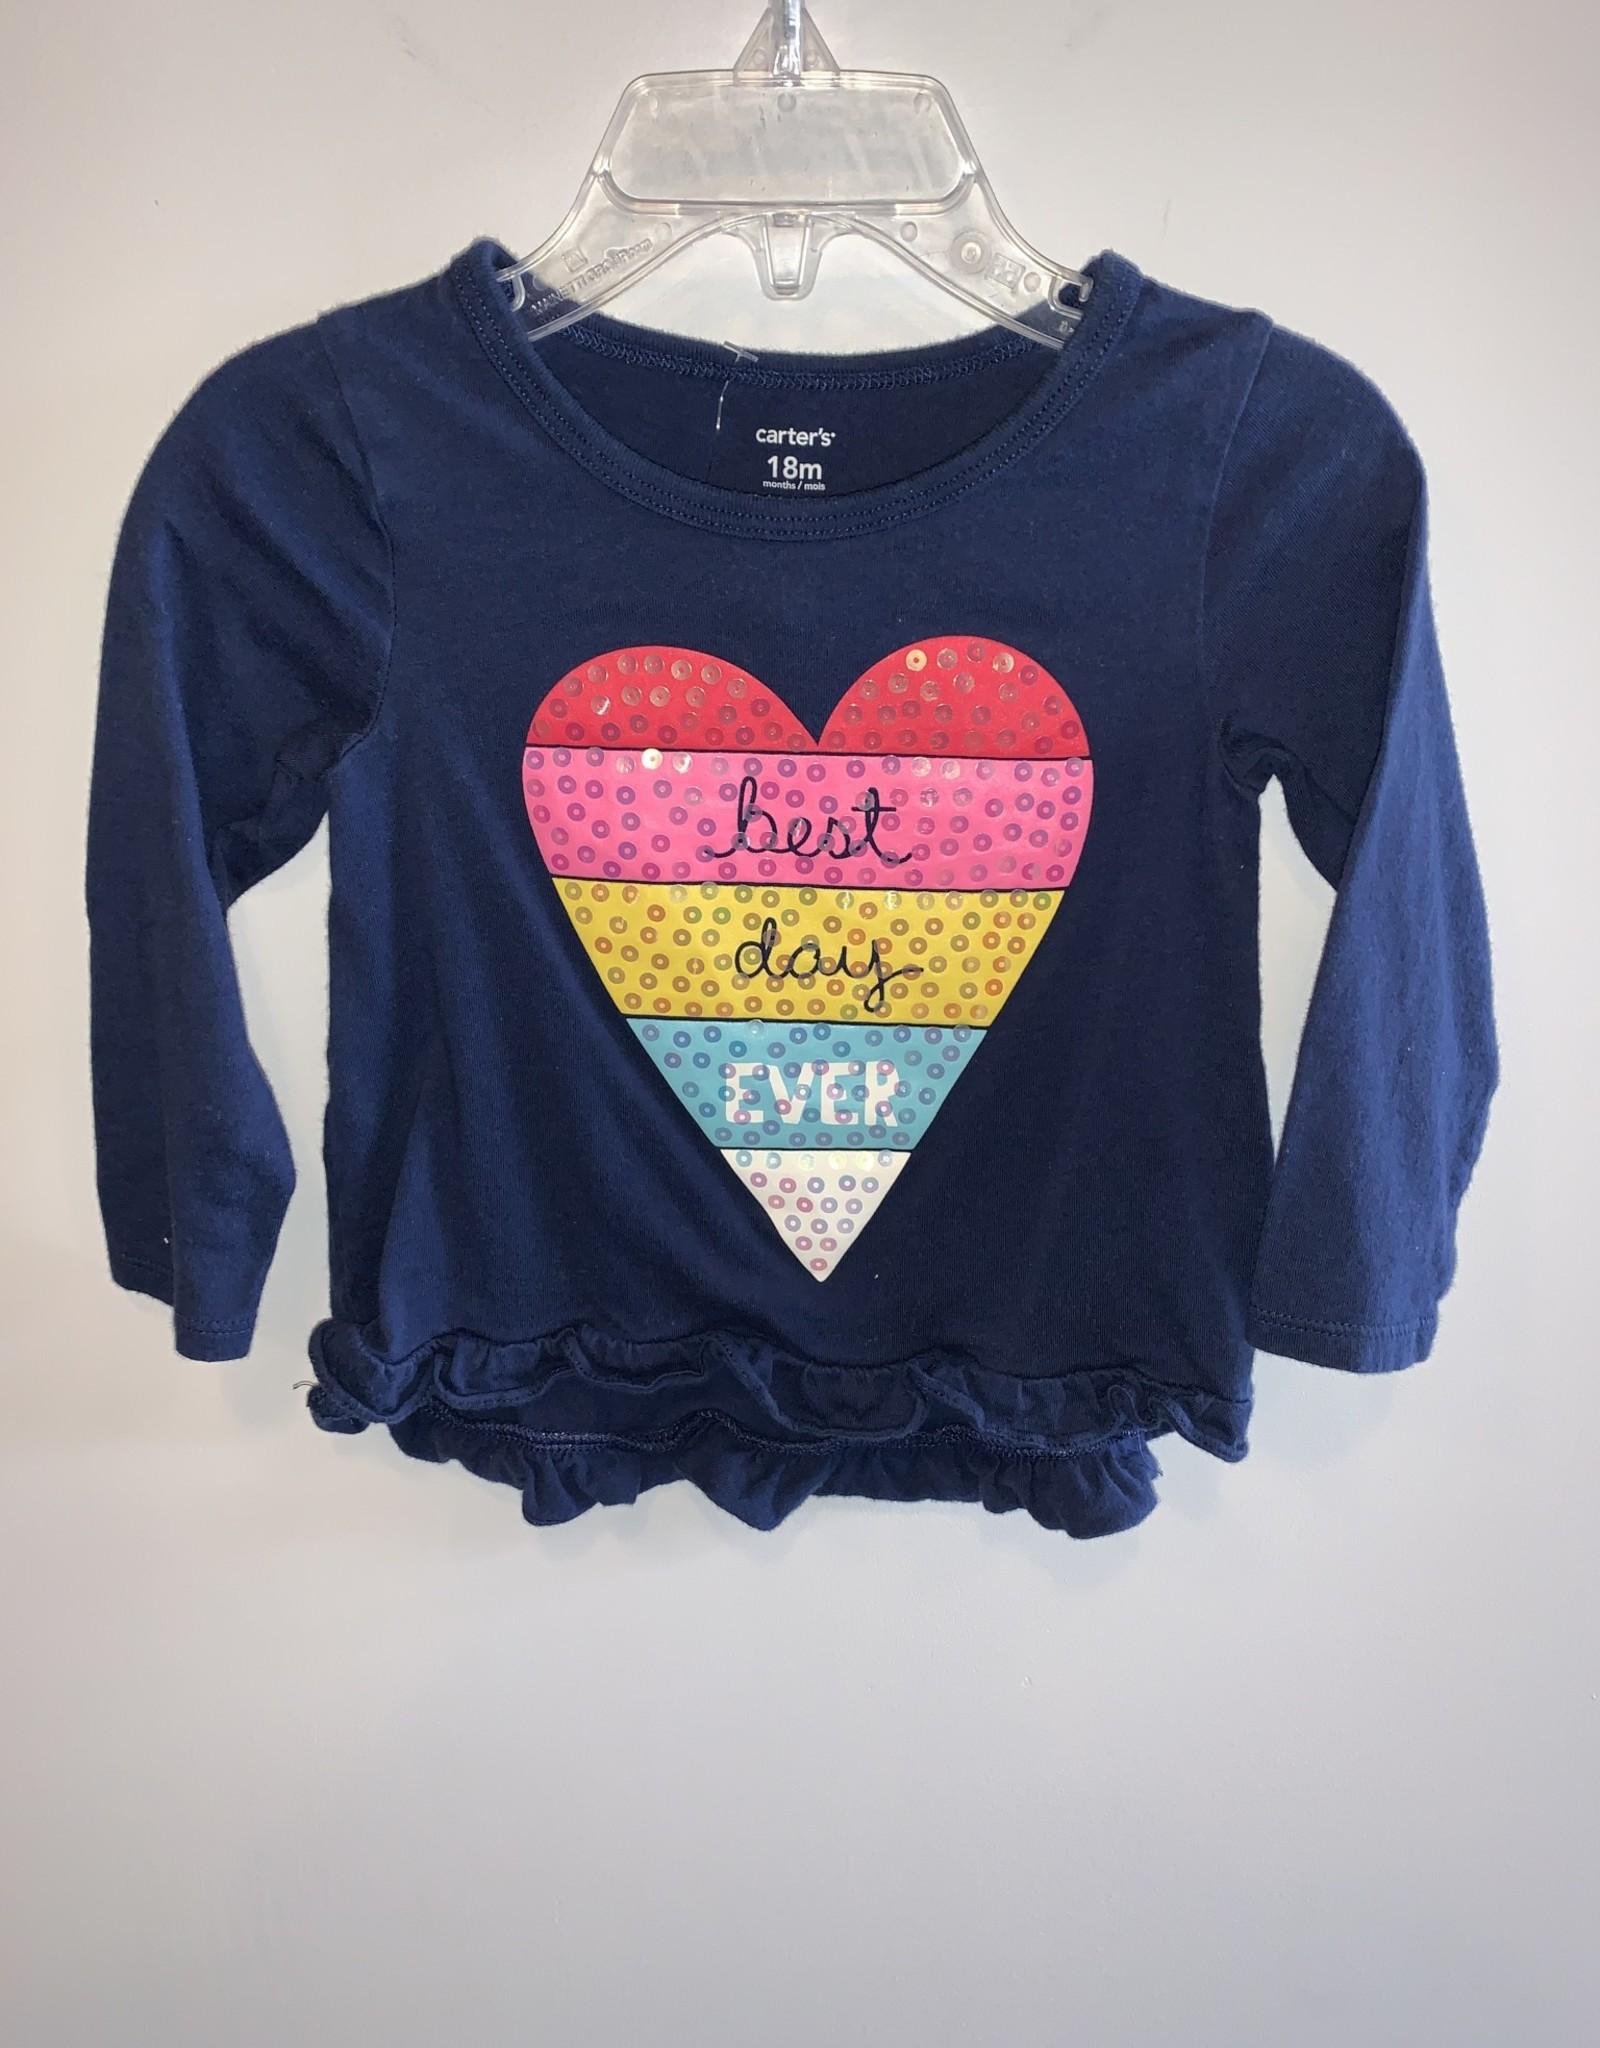 Carter's Girls/12-18/Carters/Shirt